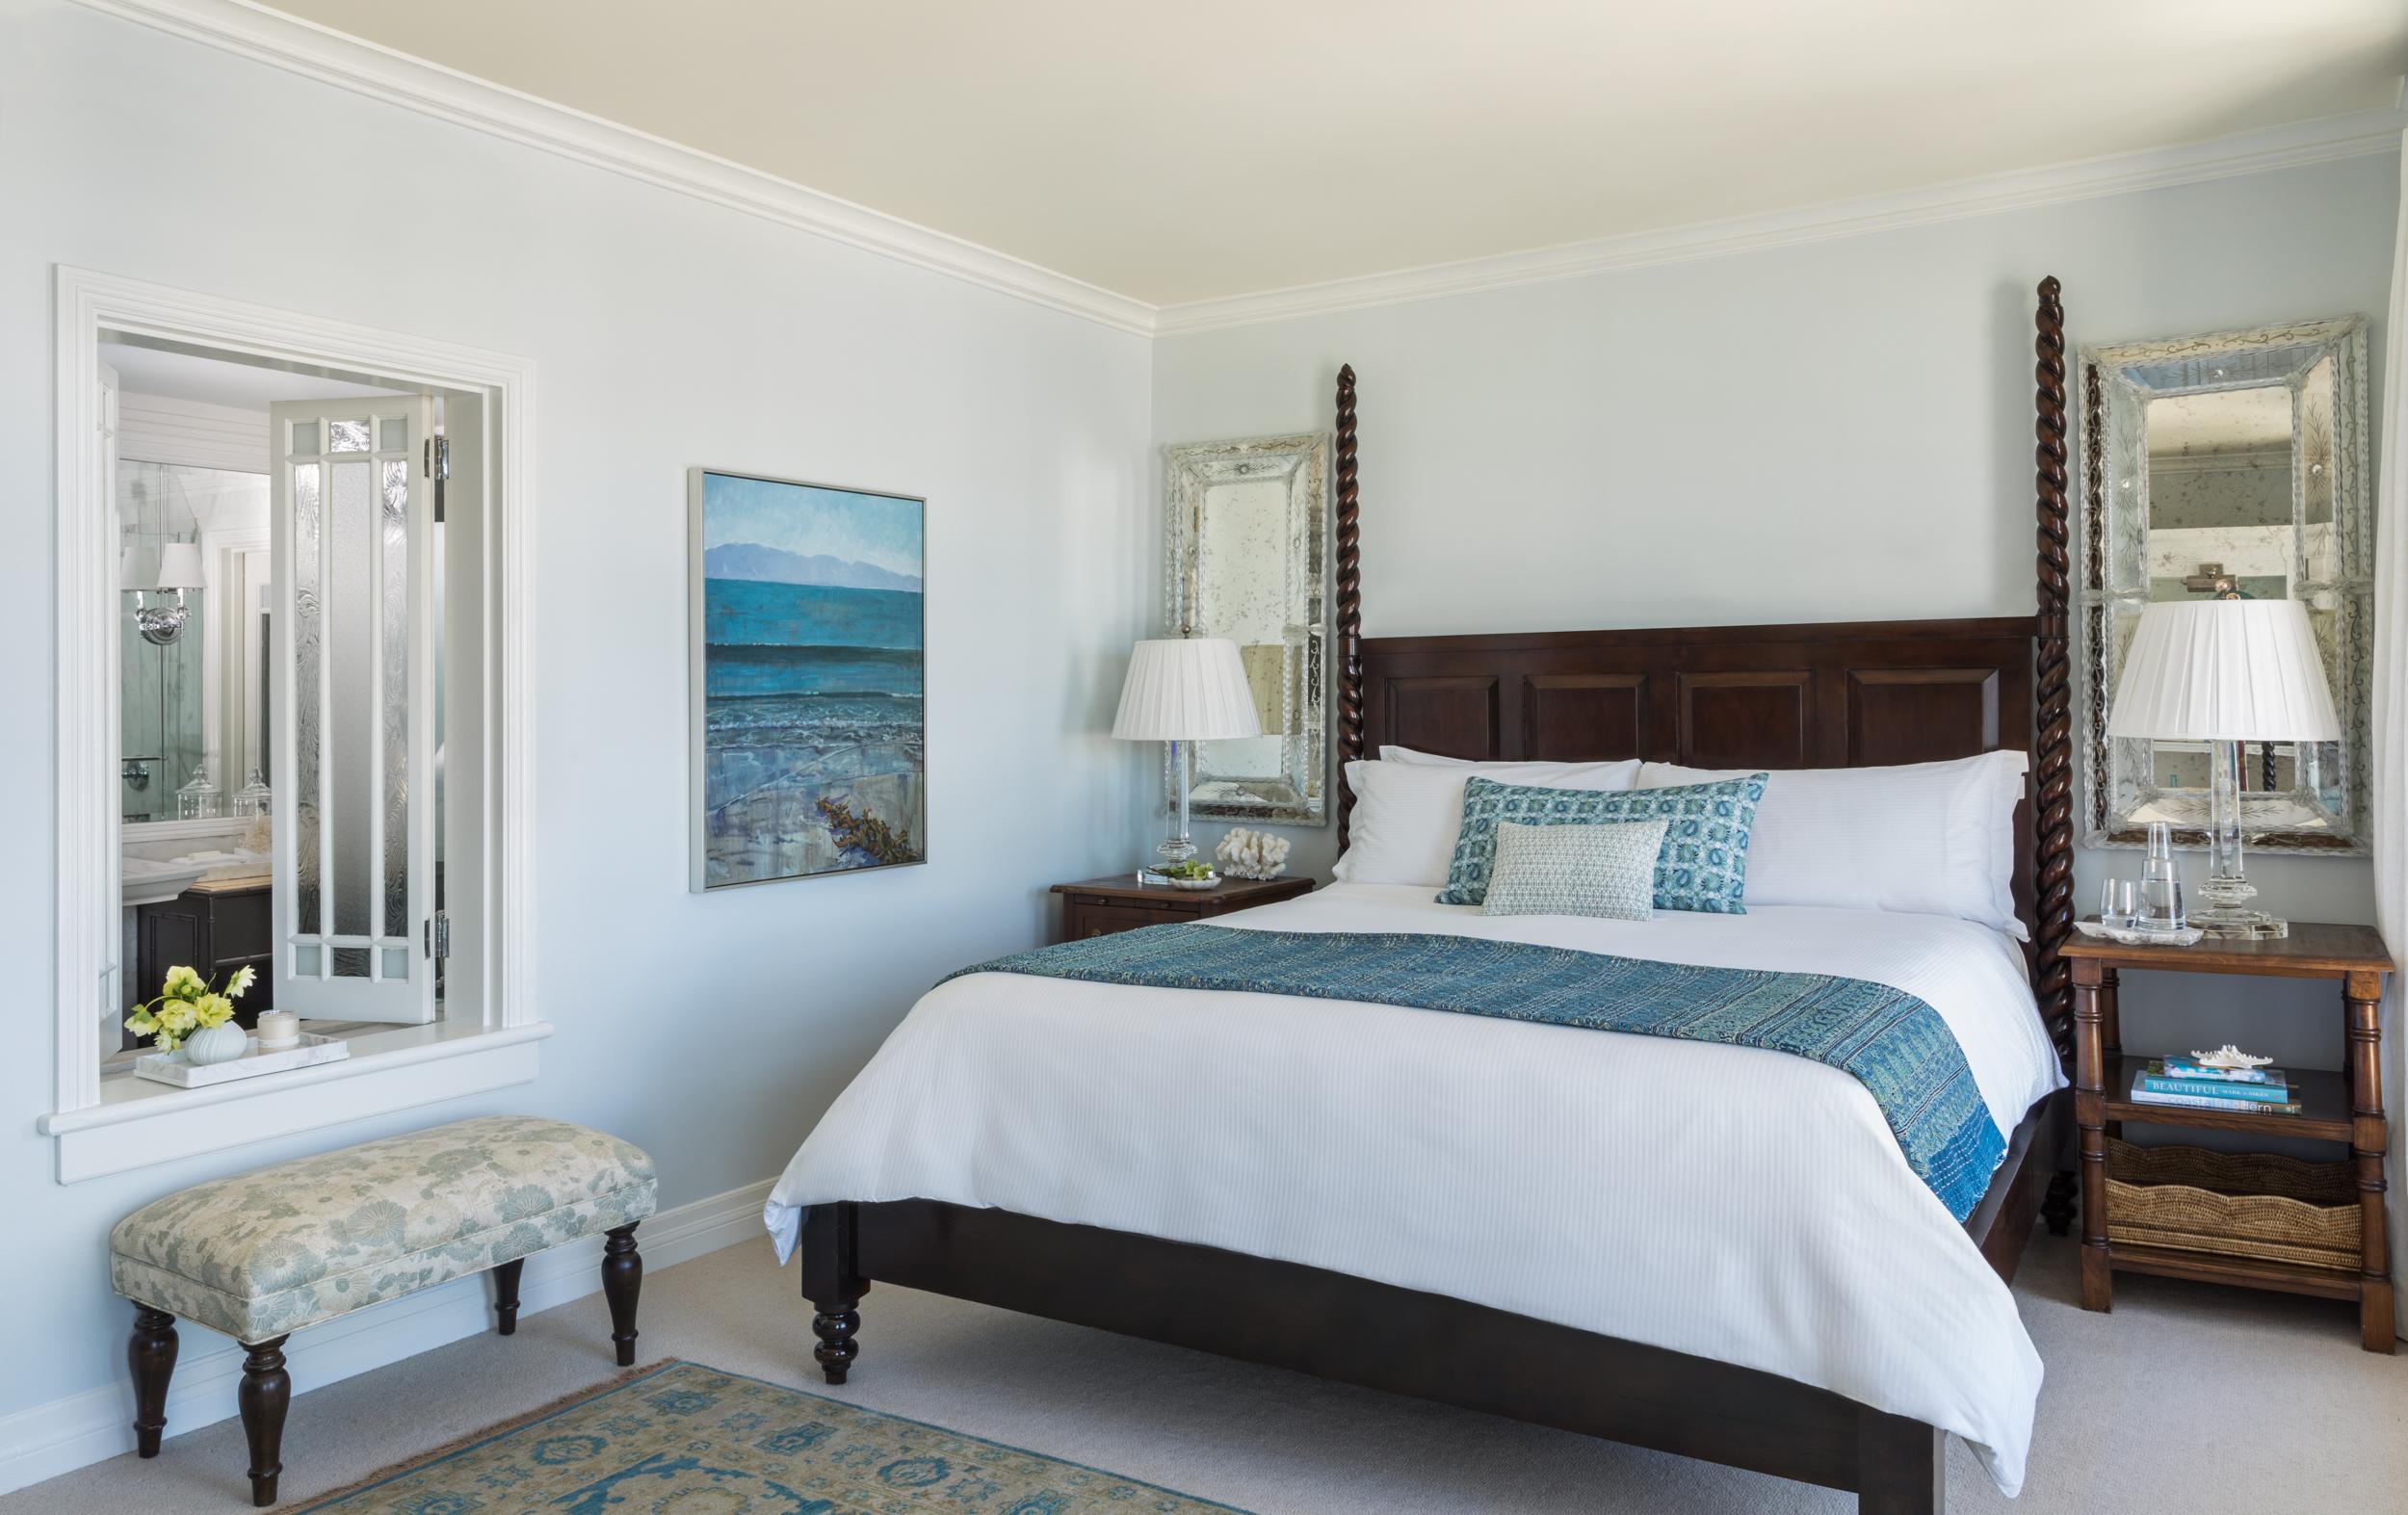 Upcoming Events in Santa Monica at Luxury Beach Hotel | Hotel Casa ...